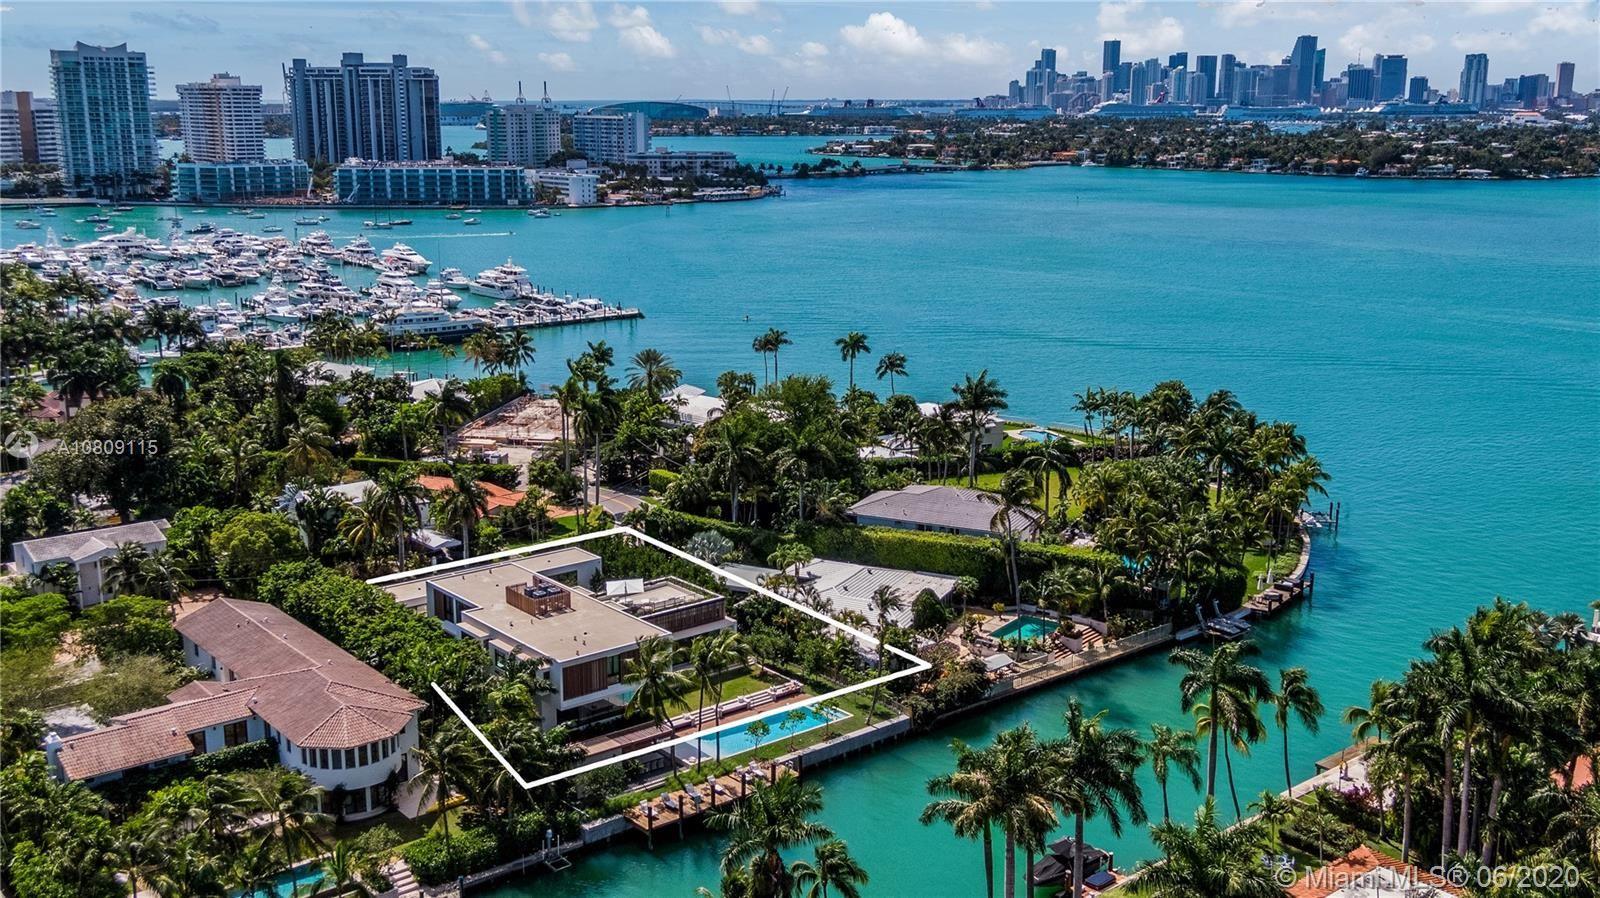 Photo 50 of Listing MLS a10809115 in 1635 W 22nd St Miami Beach FL 33140